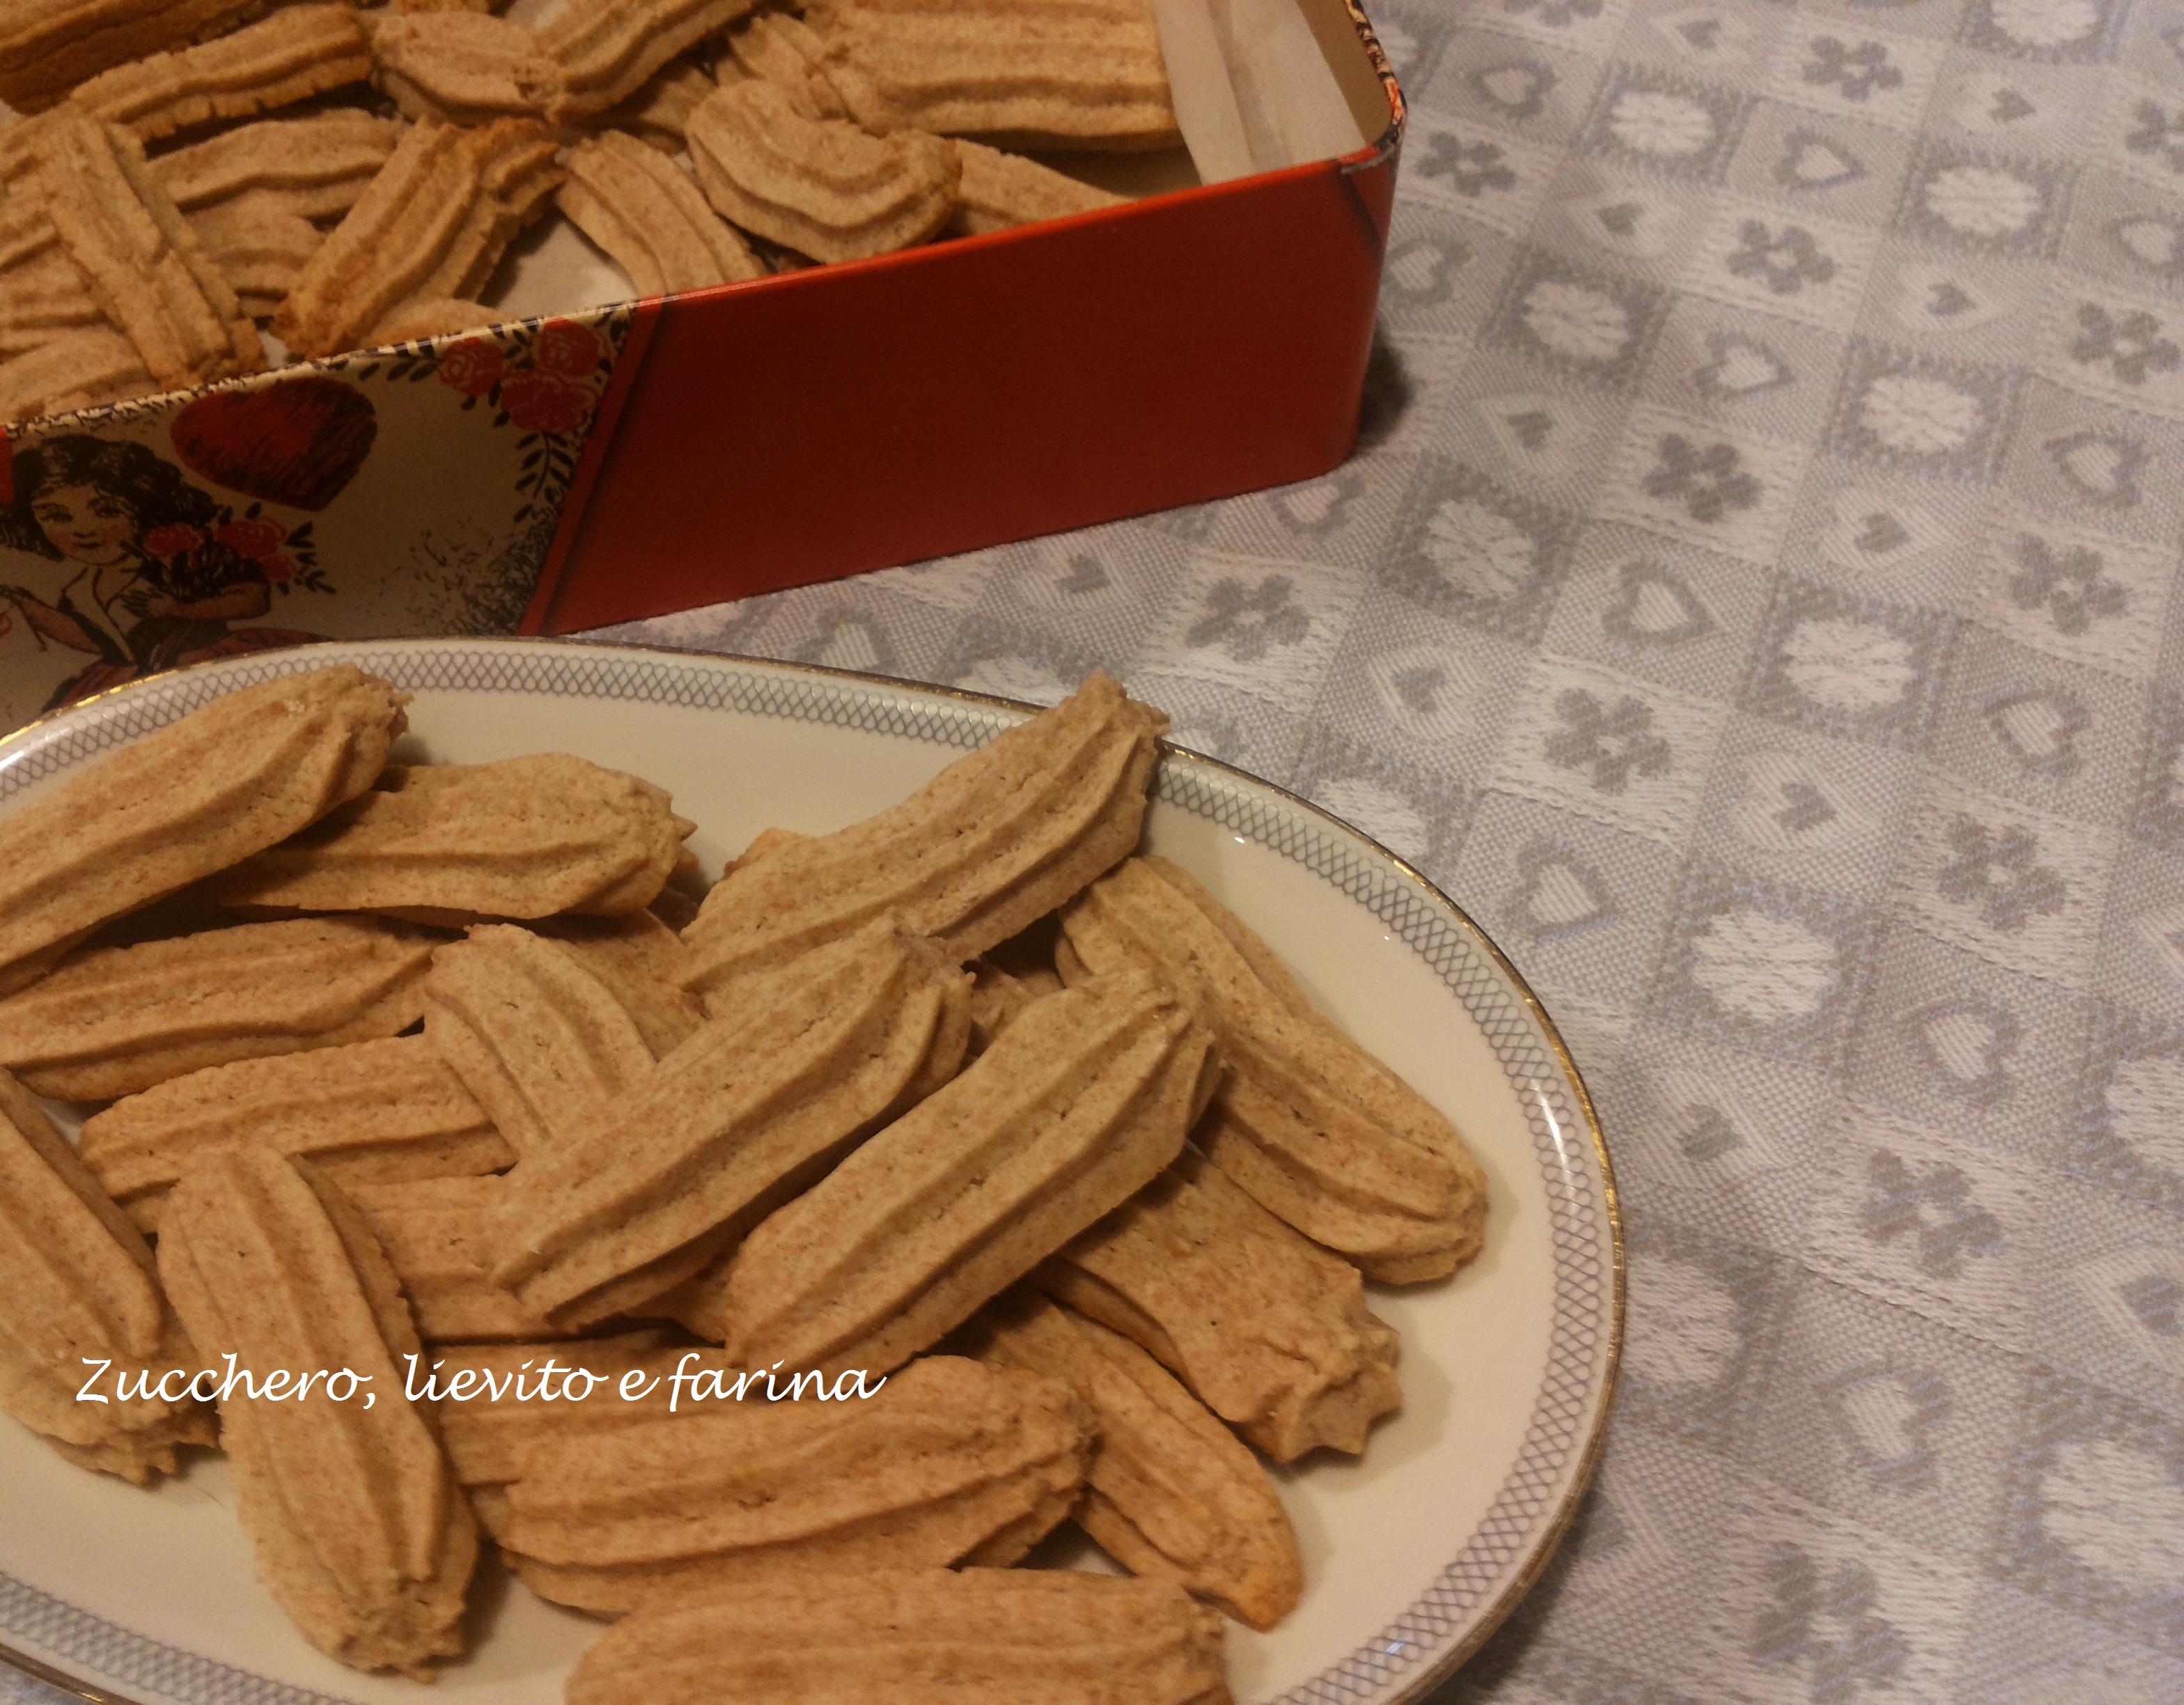 Ricetta Krumiri Senza Lievito.Krumiri Al Farro Integrale Senza Zucchero Ricetta Biscotti Leggeri